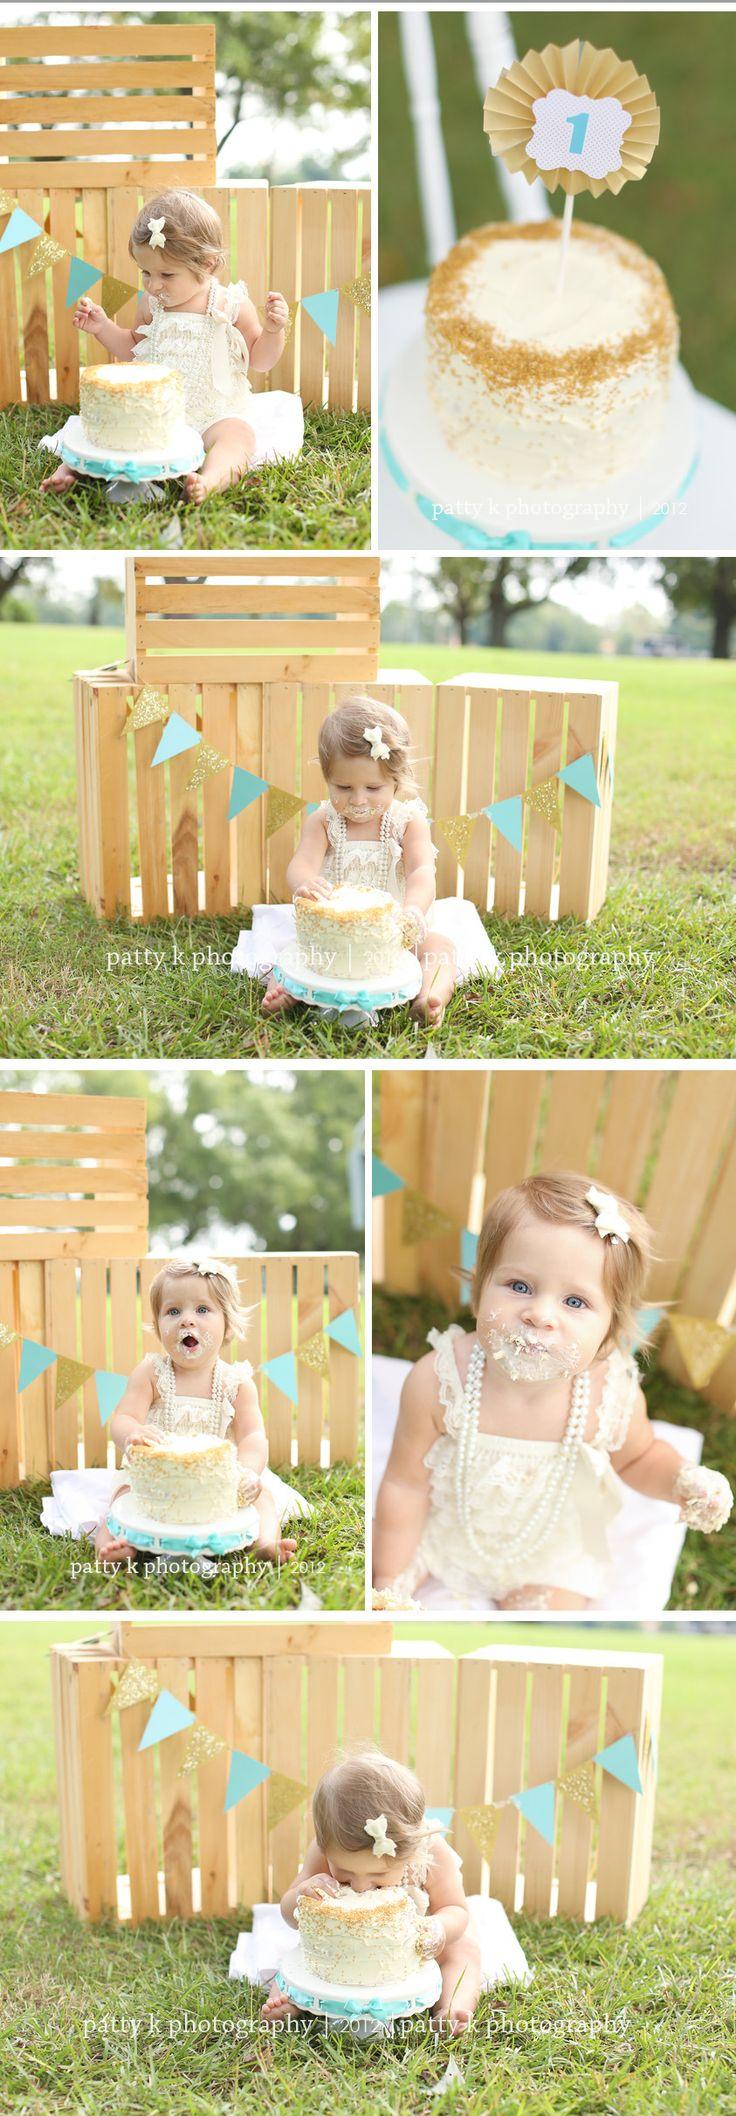 Cake Smash | Ella | Fayetteville, NC Photographer | Patty K Photography